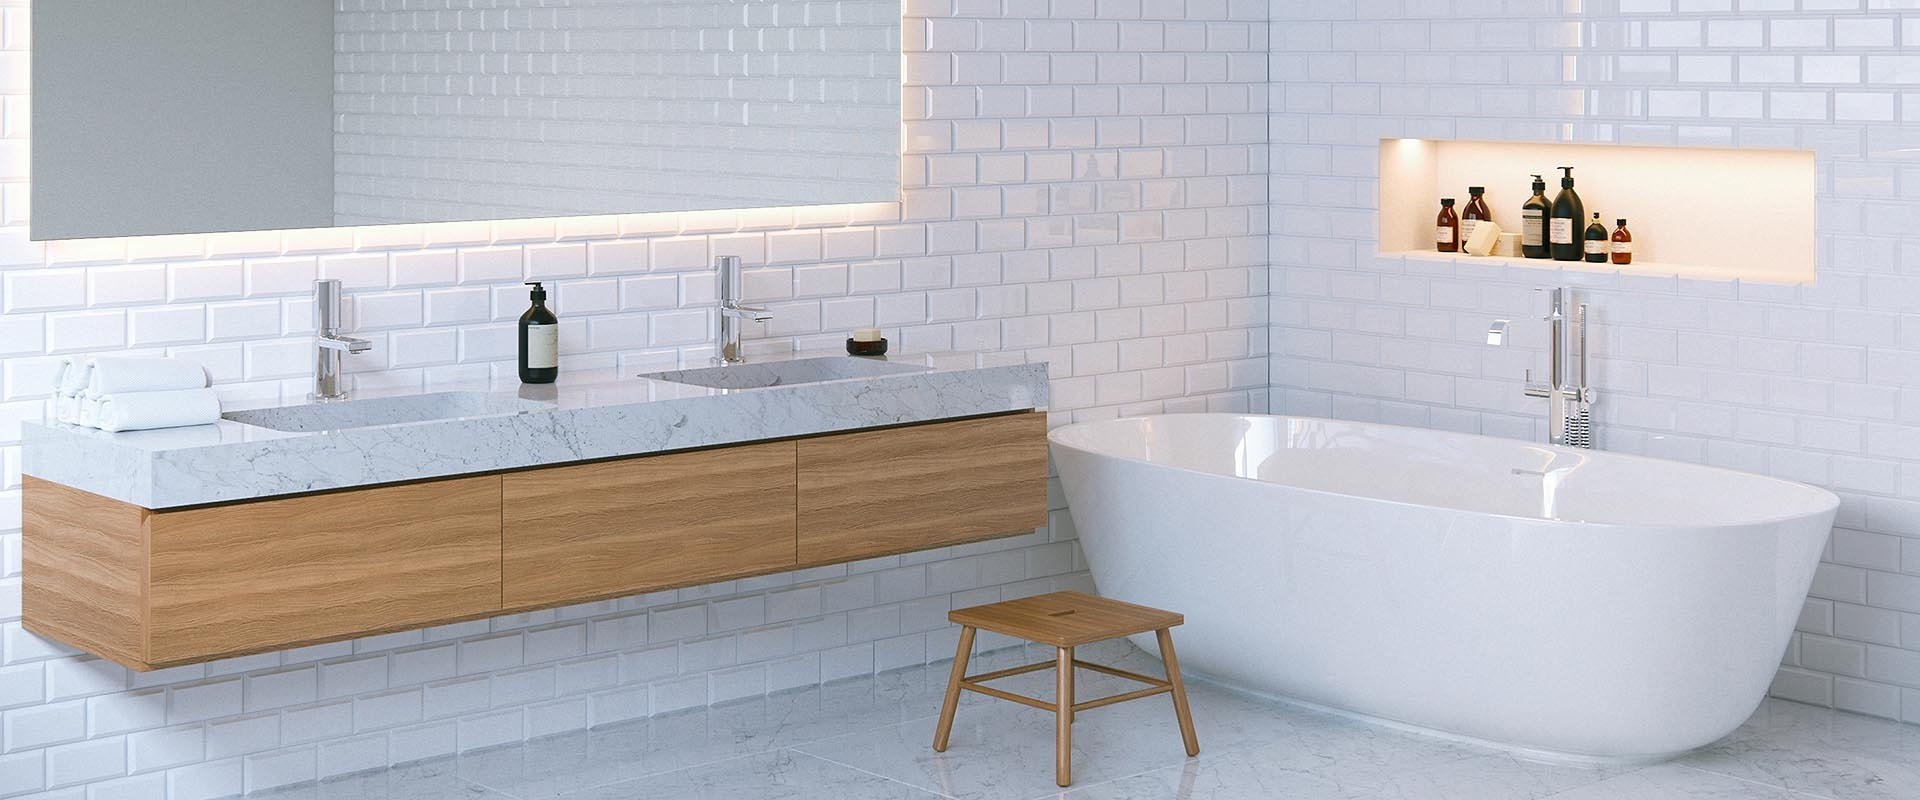 Photo Salle Bain Moderne salle de bain moderne minimaliste | ciot